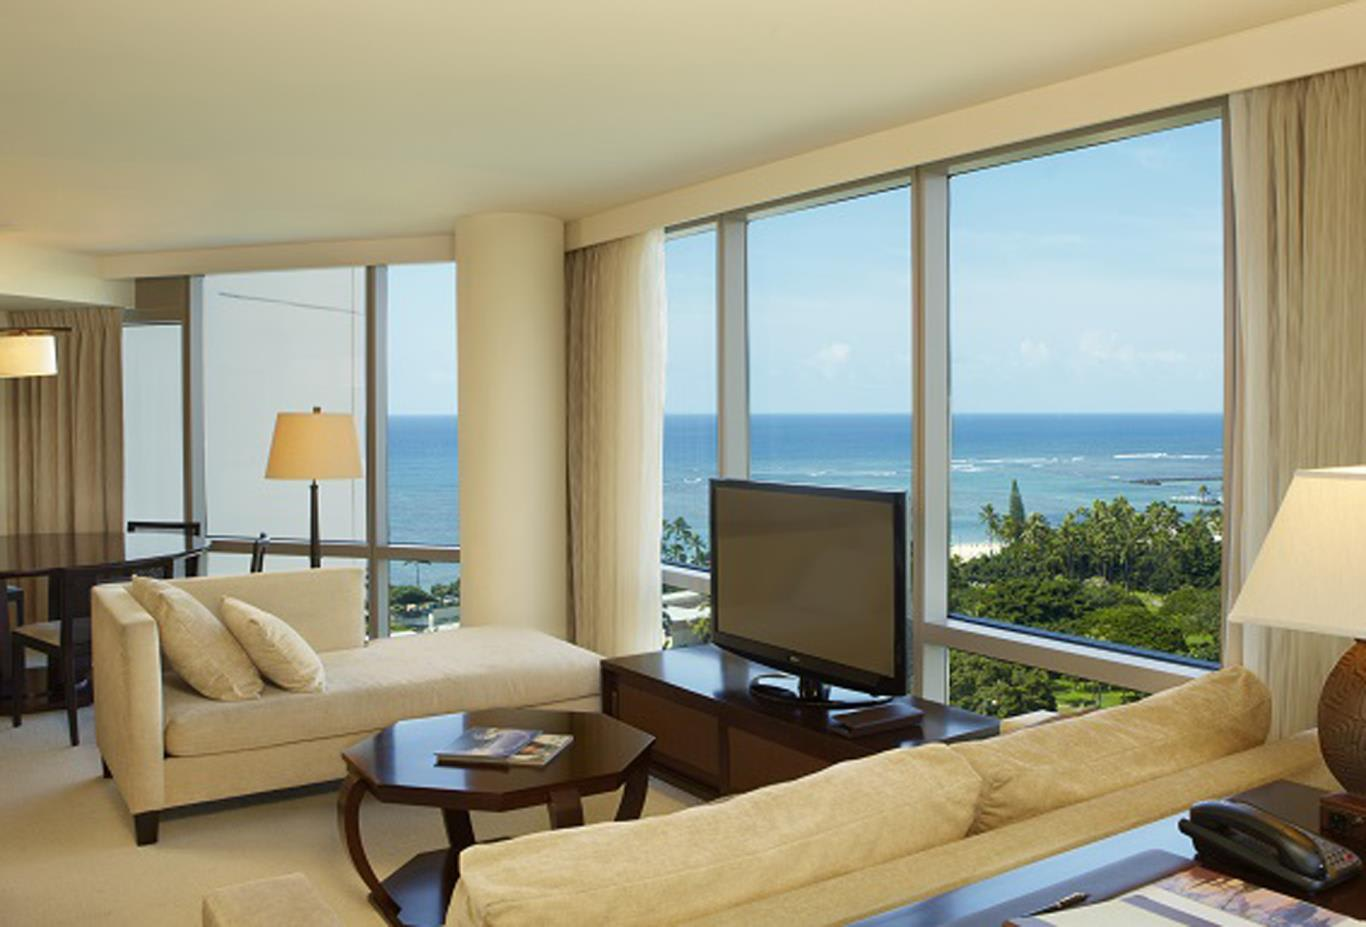 Delxue Two Bedroom Suite